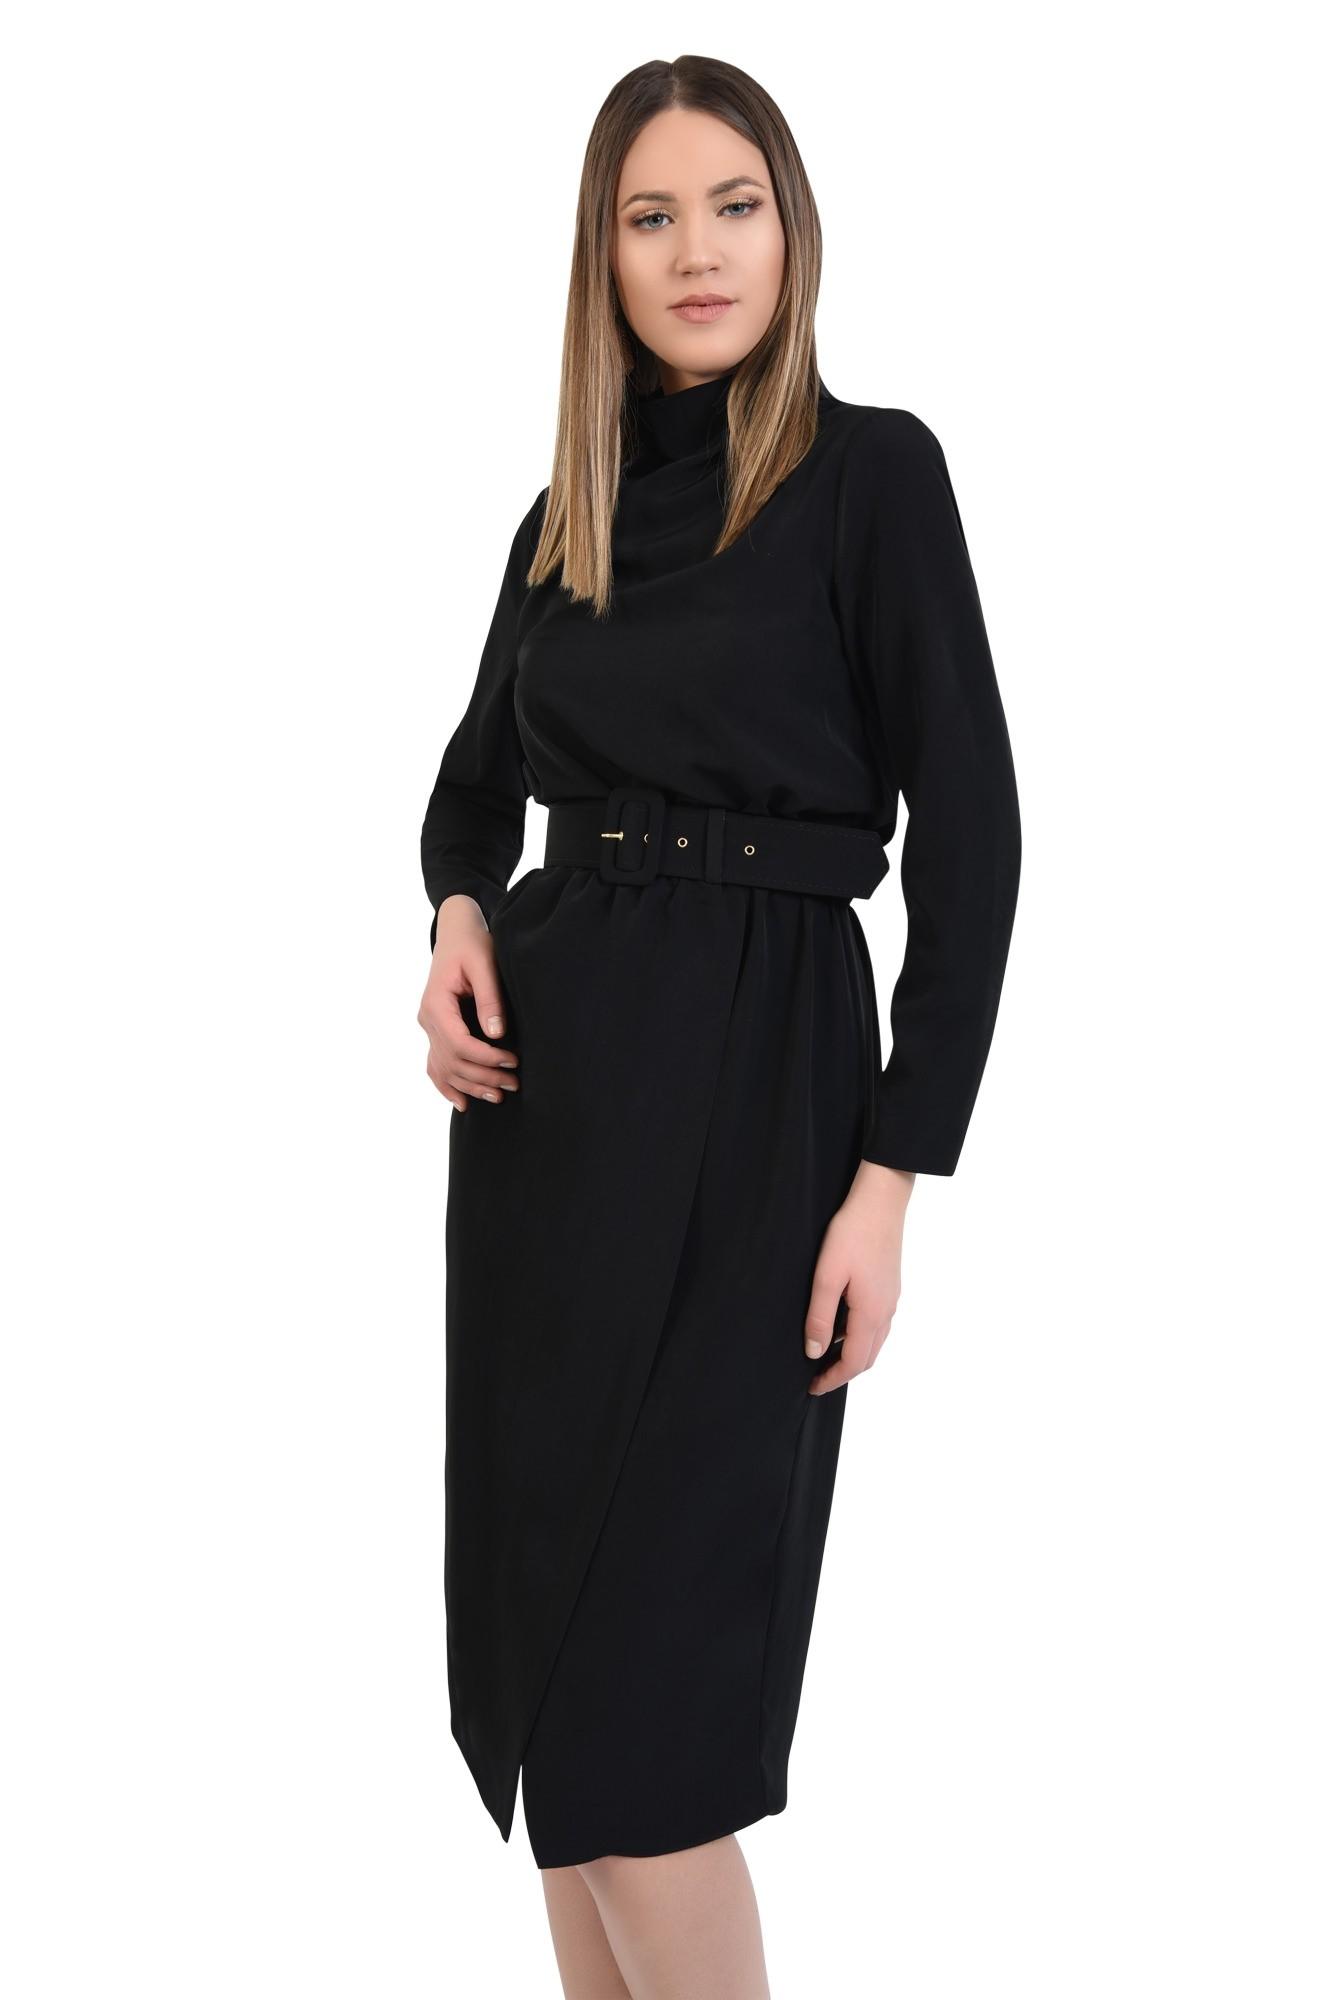 0 - rochie neagra, de zi, croi cambrat cu elastic, maneci lungi